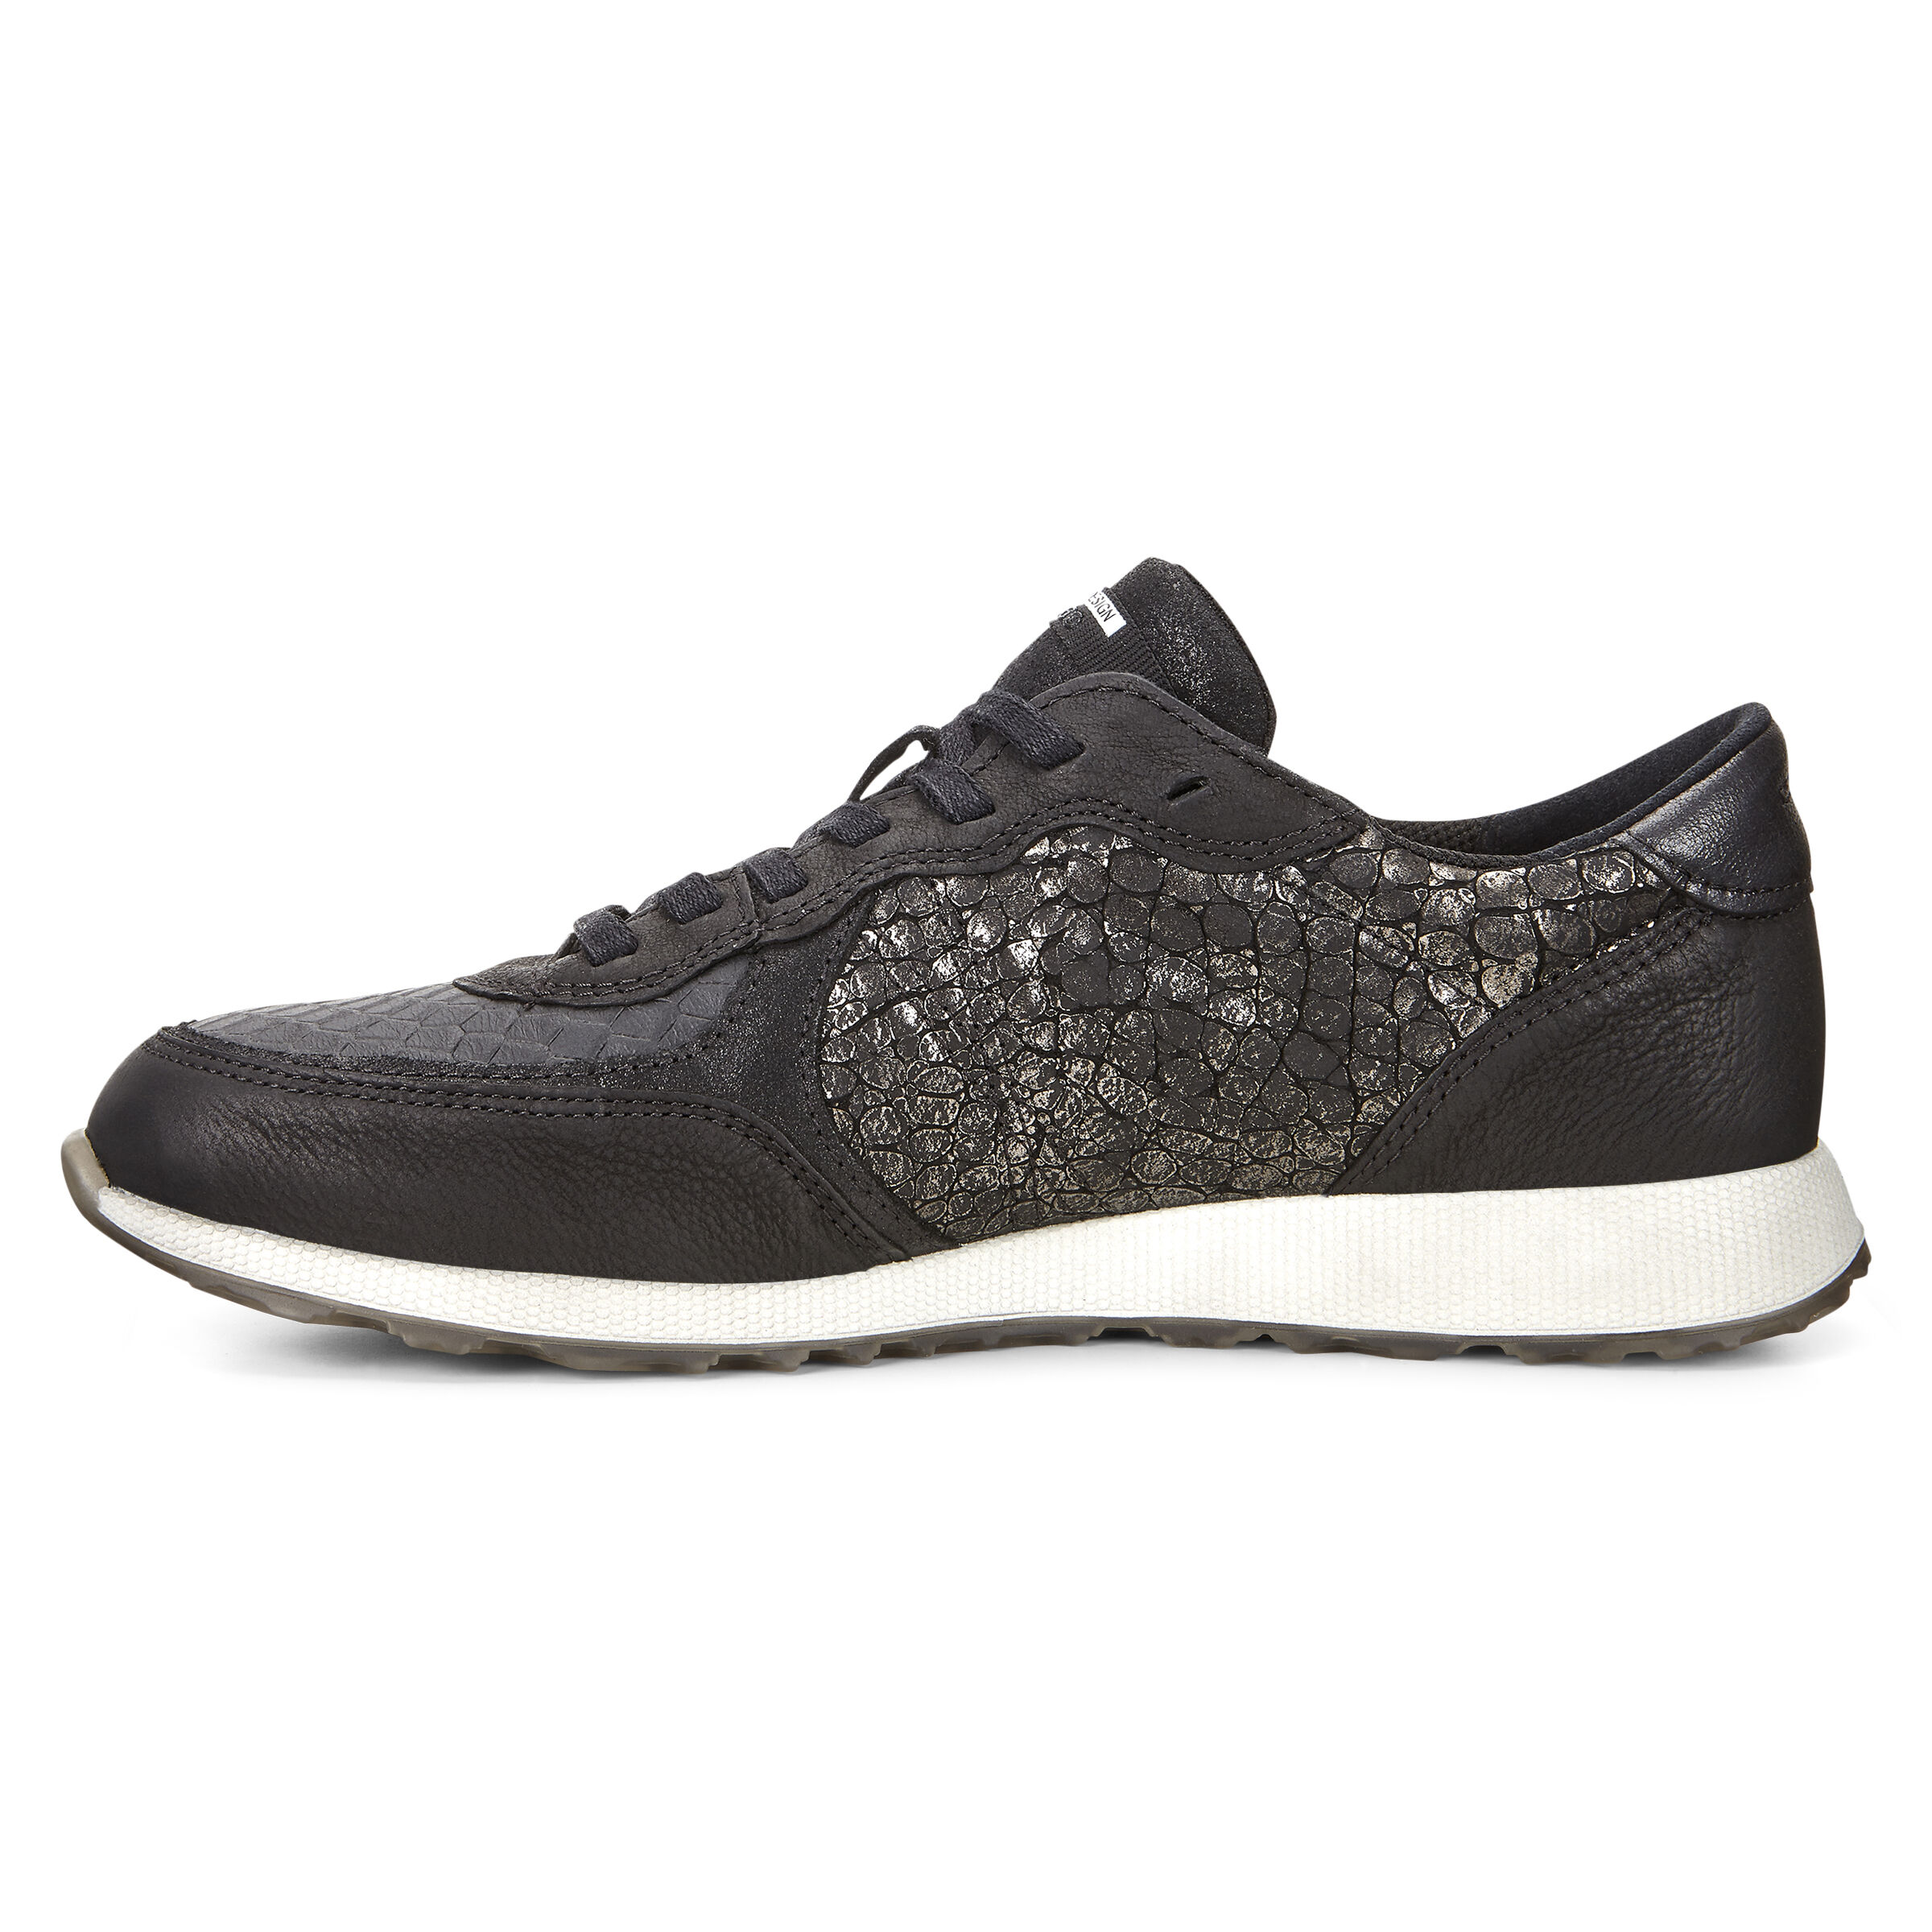 ECCO Damen Sneak Ladies Sneaker